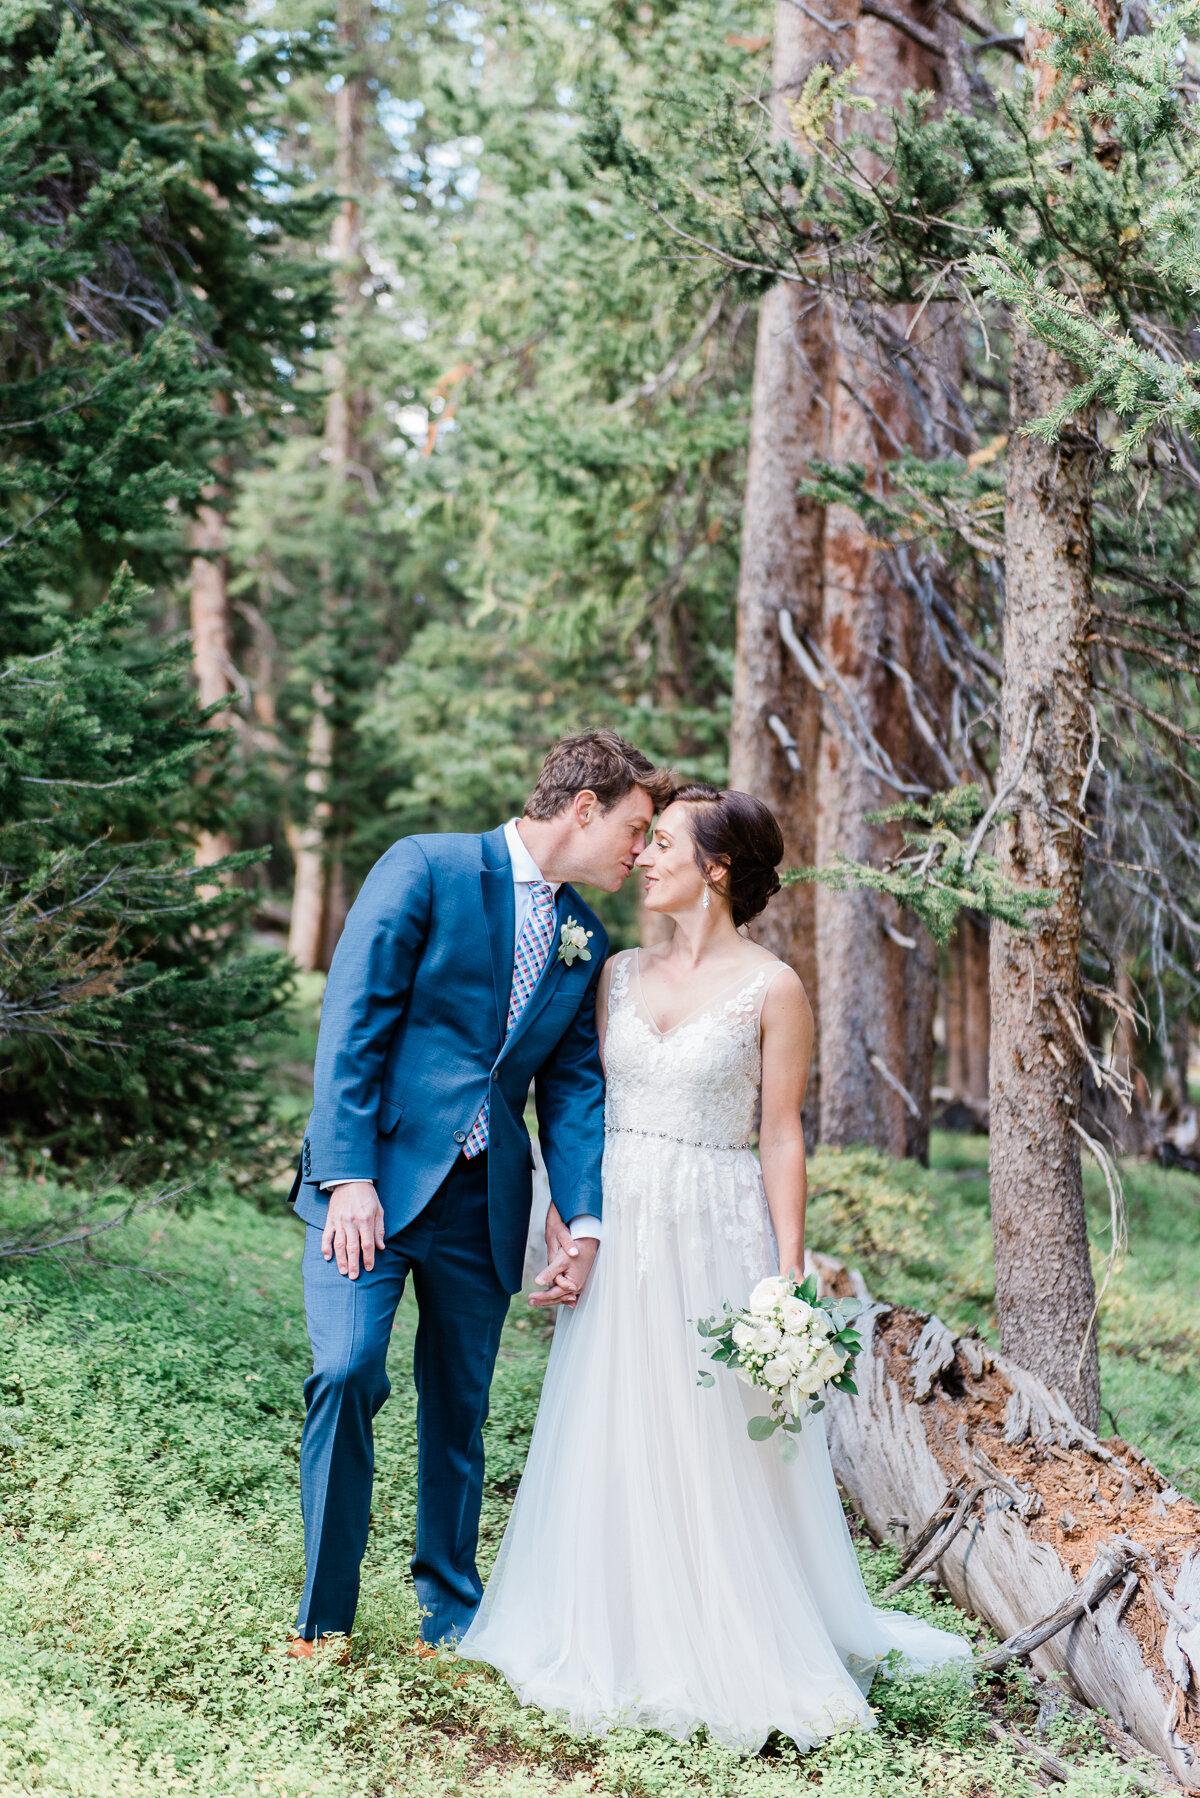 AshleighMillerPhotography-Wedding-Natalia-Matt-ArapahoeBasin-Colorado-5.jpg